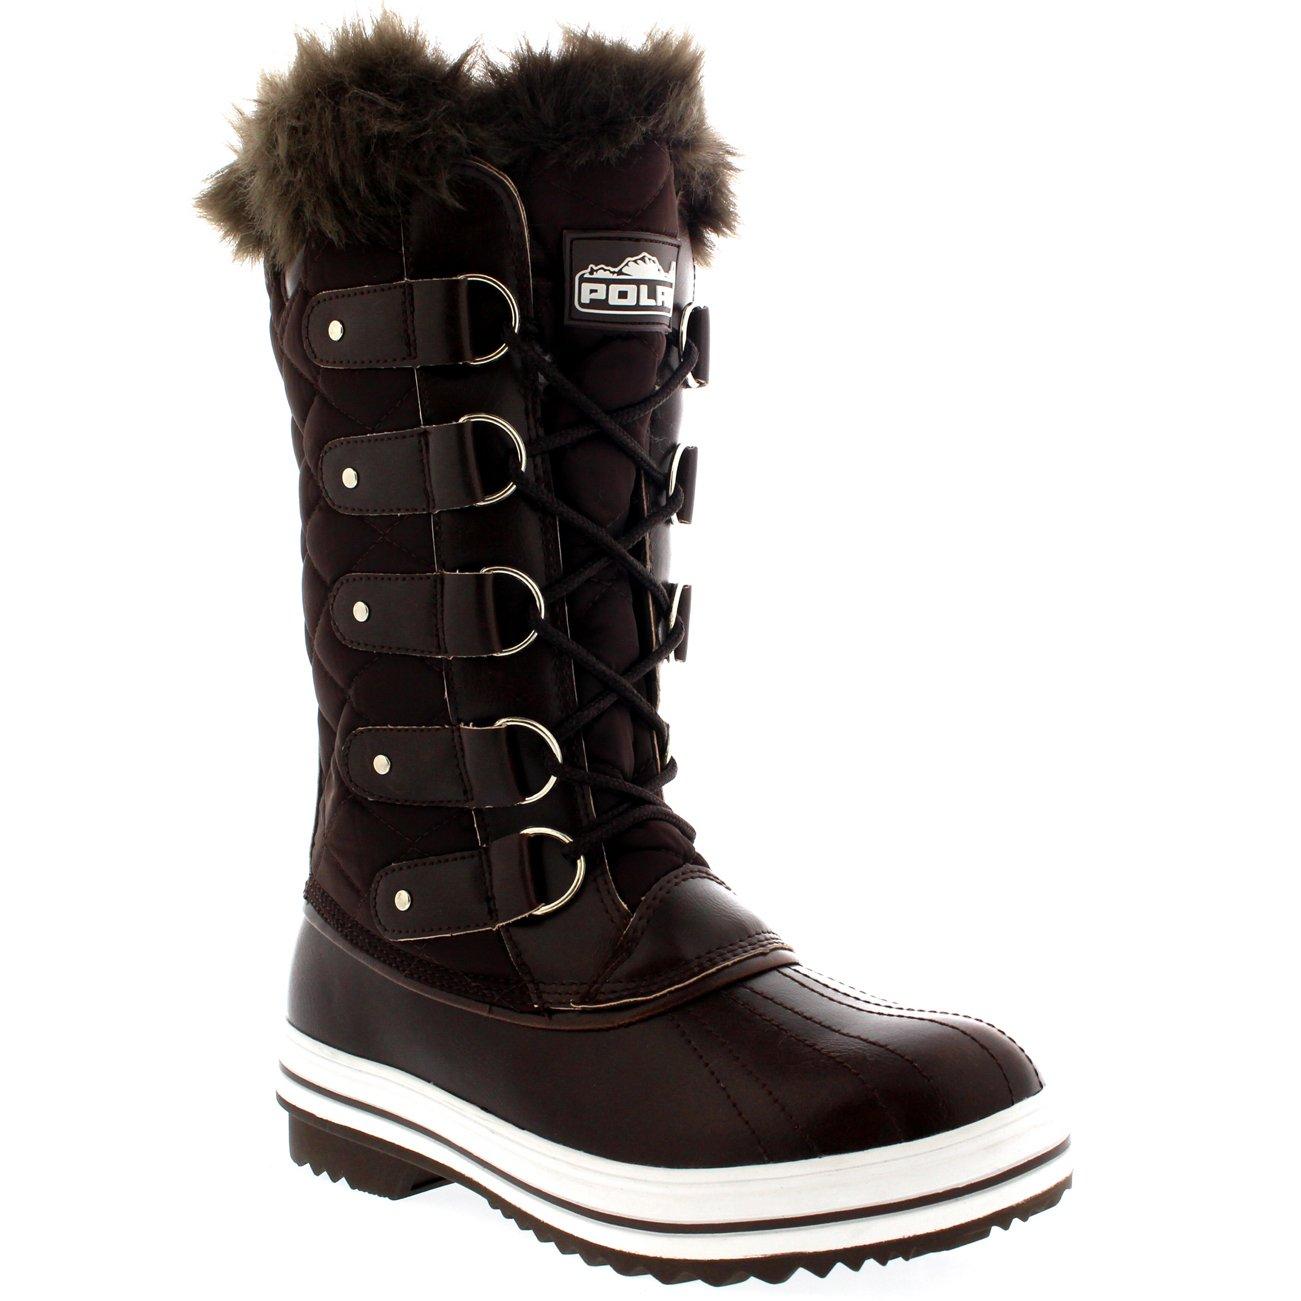 65655572f56 Polar Womens Snow Boot Quilted Tall Winter Snow Waterproof Warm Rain Boot